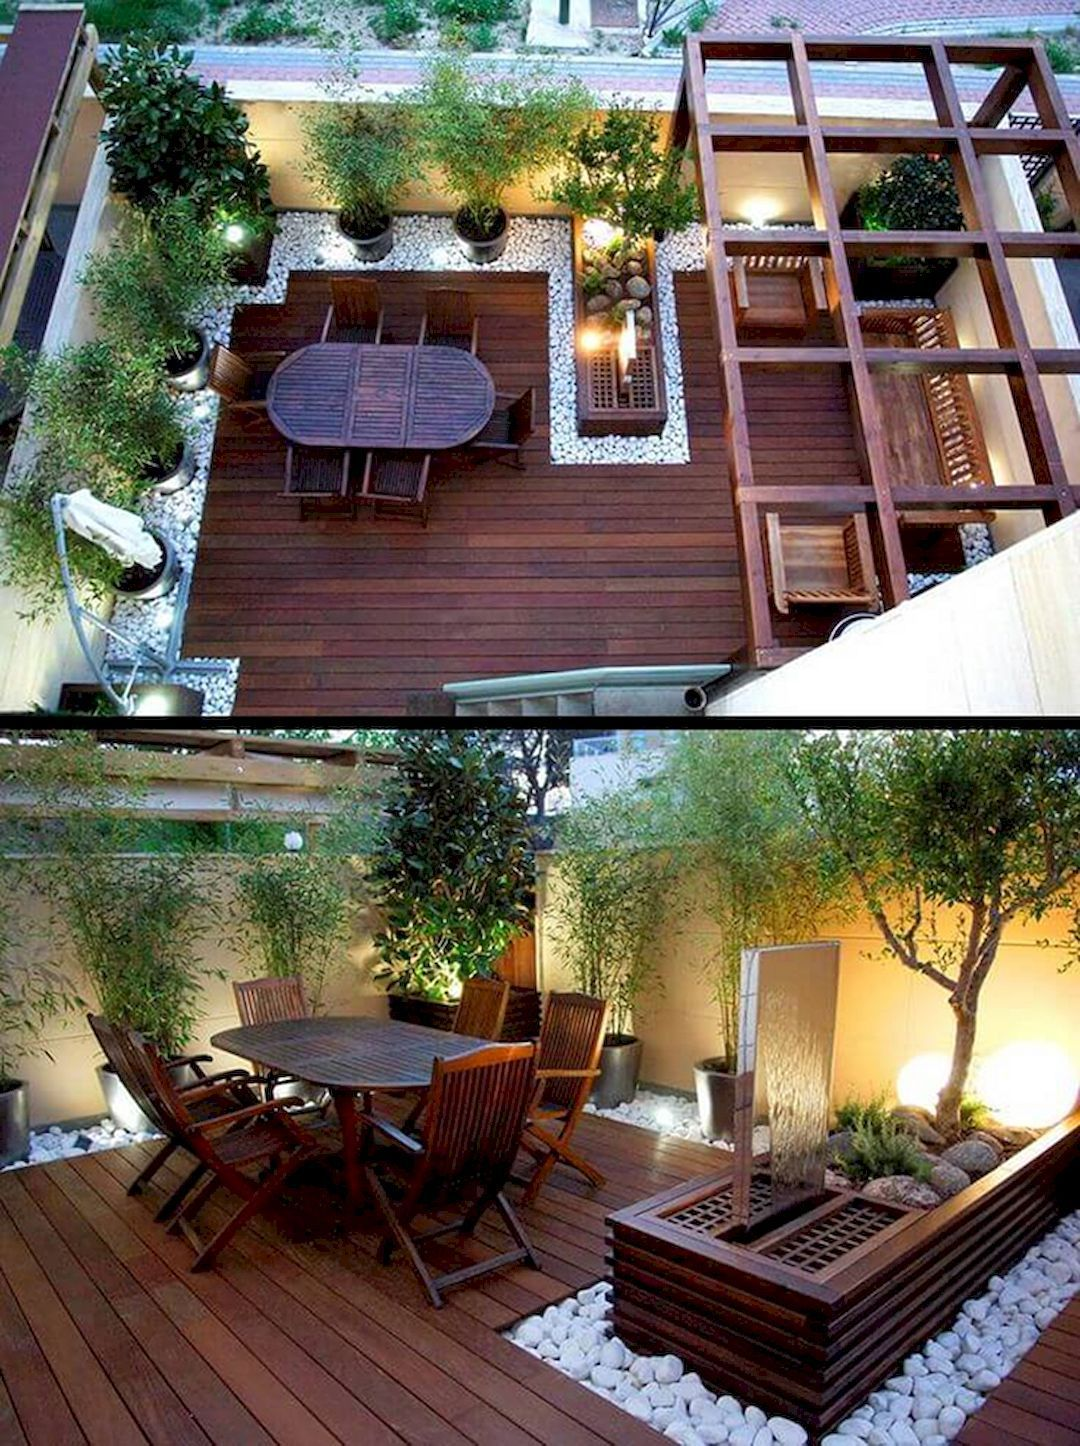 4 Tips To Start Building A Backyard Deck Rooftop Terrace Design